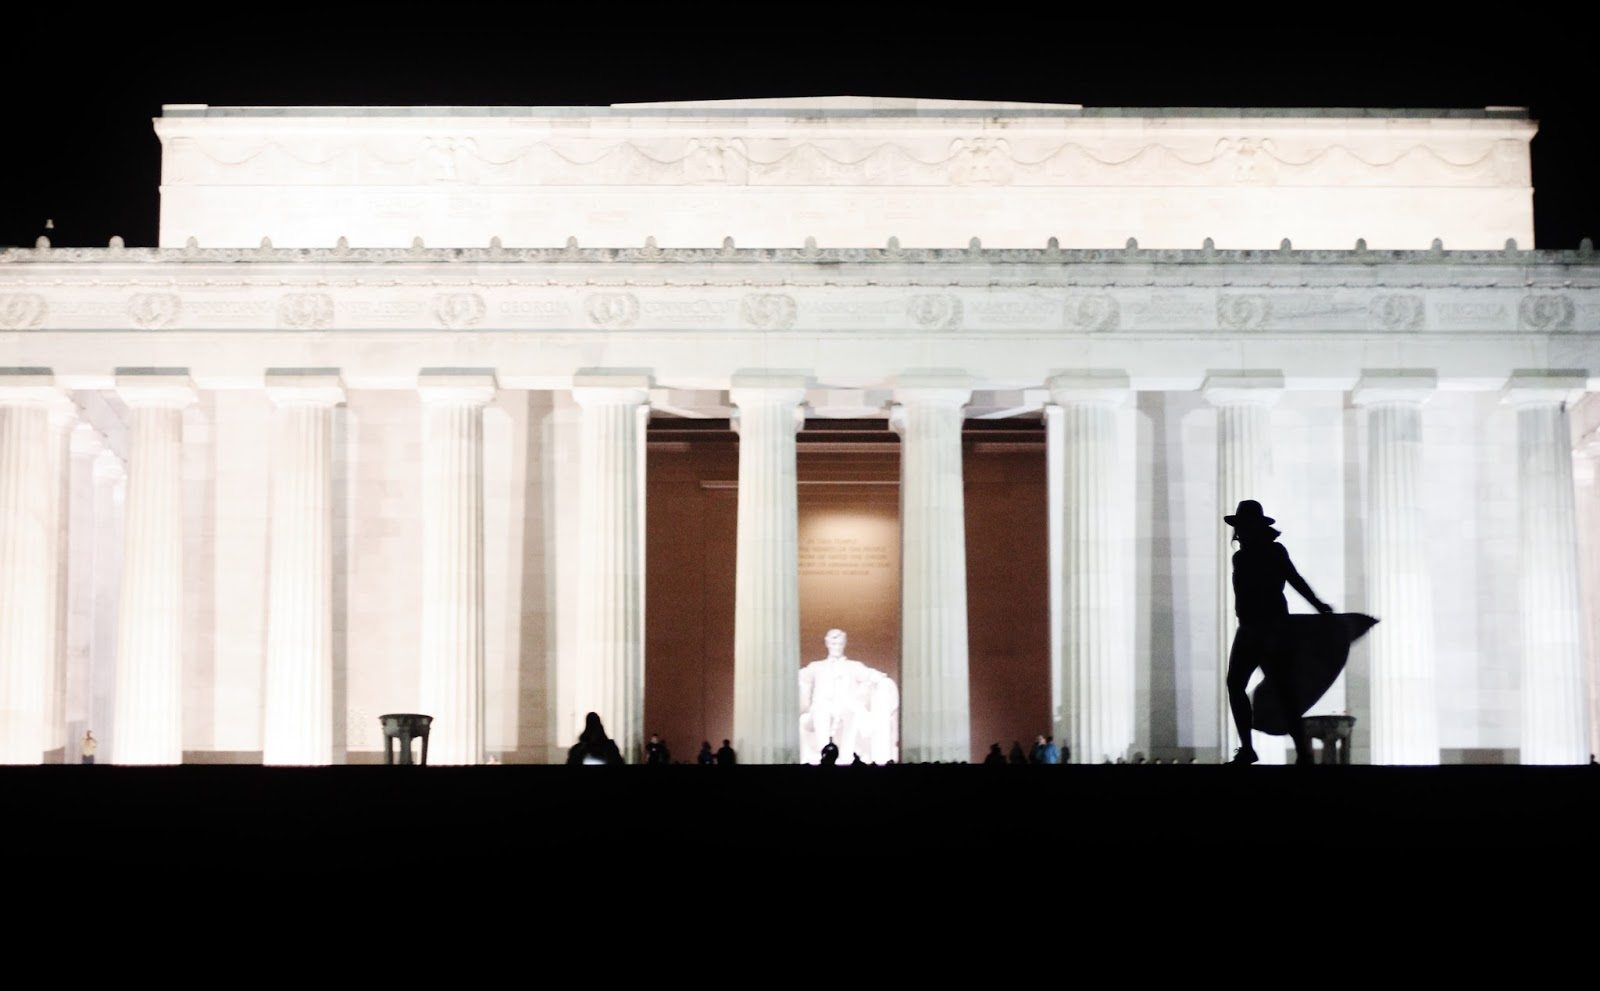 Lincoln Memorial de noche en Washington D.C.